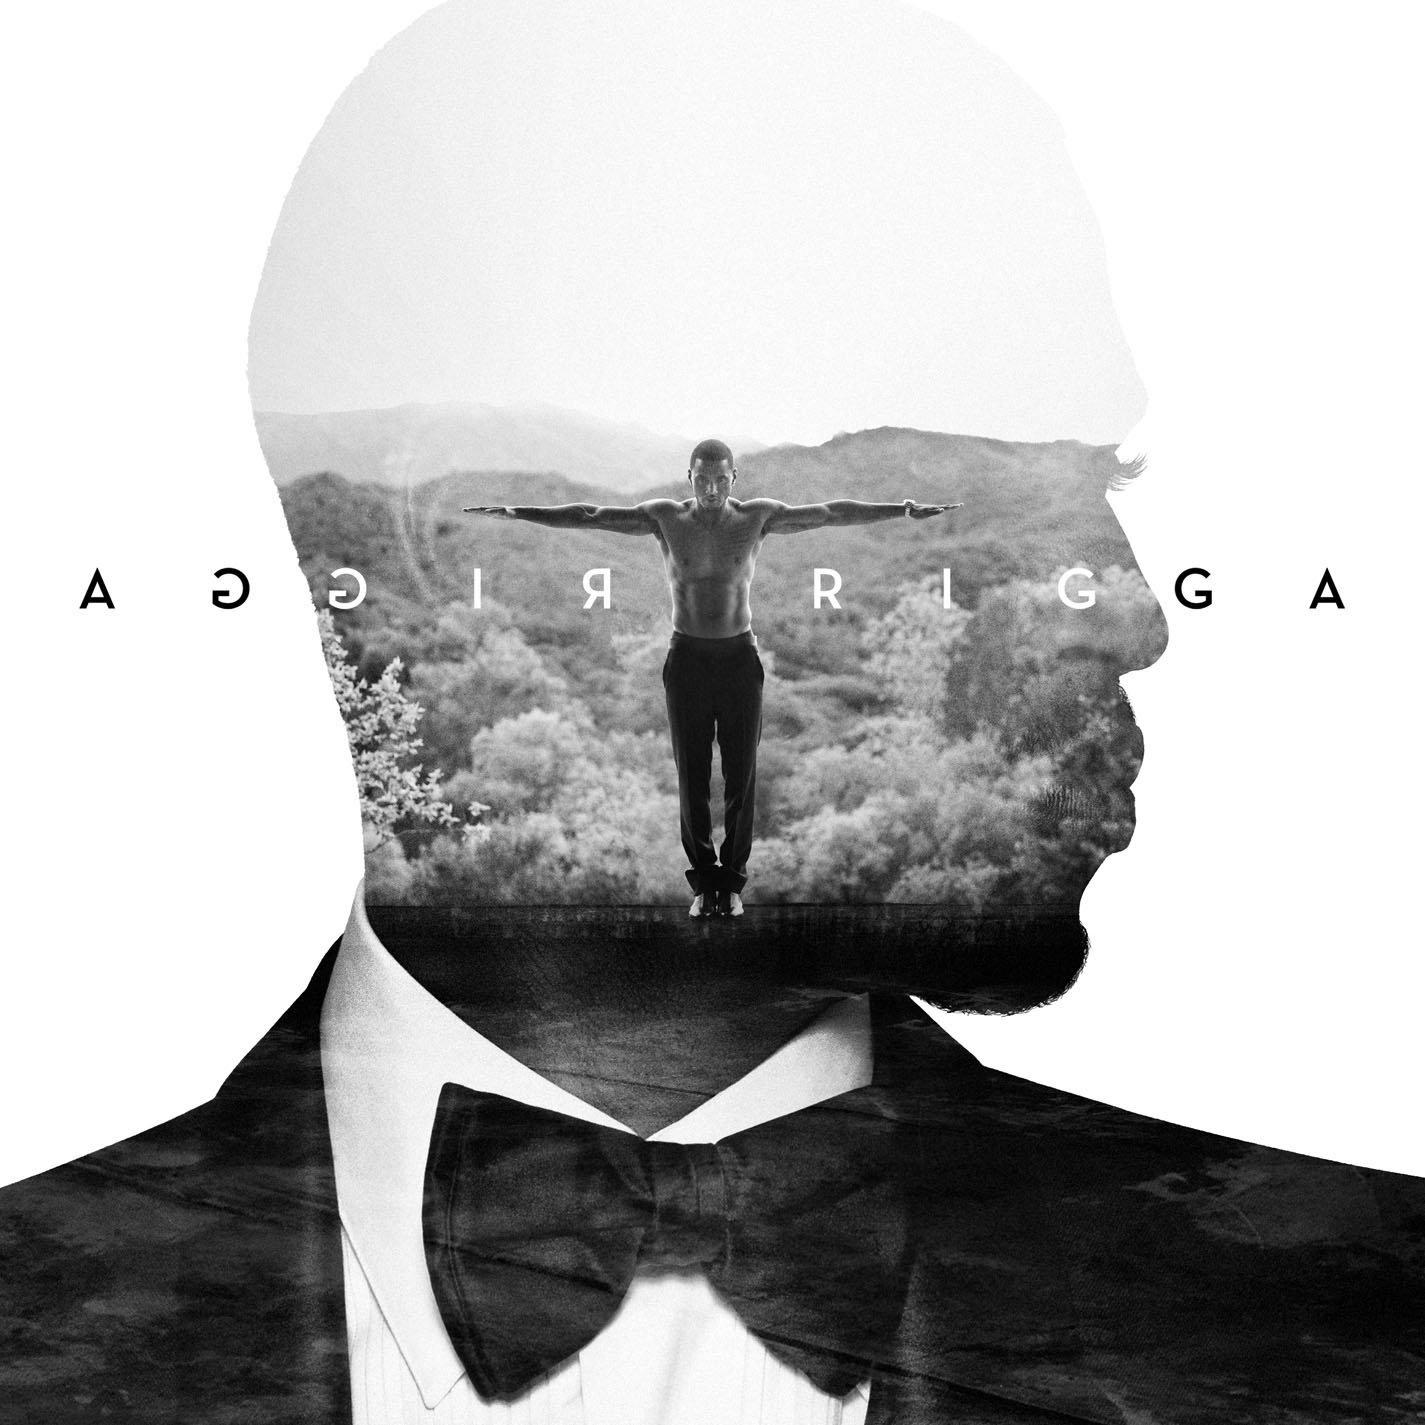 CD : Trey Songz - Trigga (Clean Version)